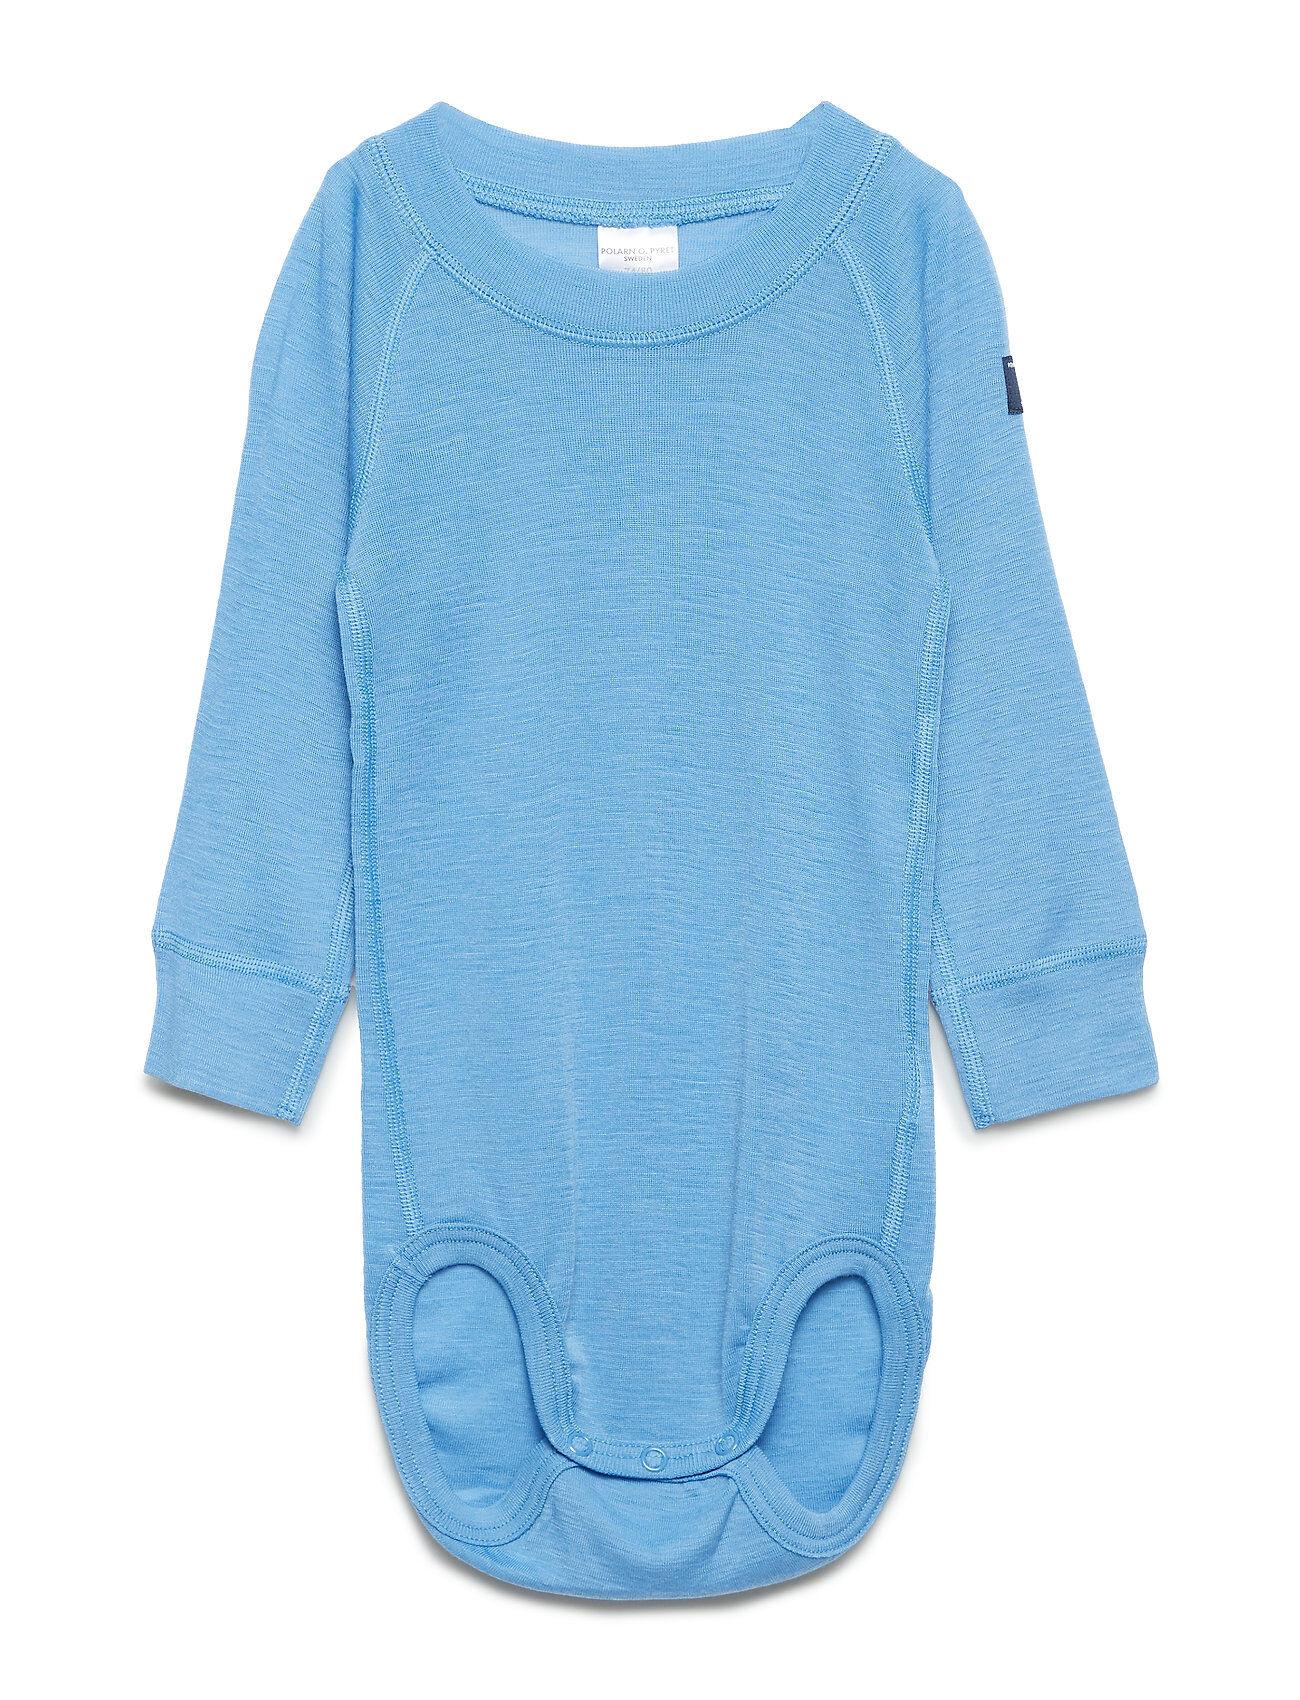 Polarn O. Pyret Body Wool Solid Baby Bodies Long-sleeved Sininen Polarn O. Pyret